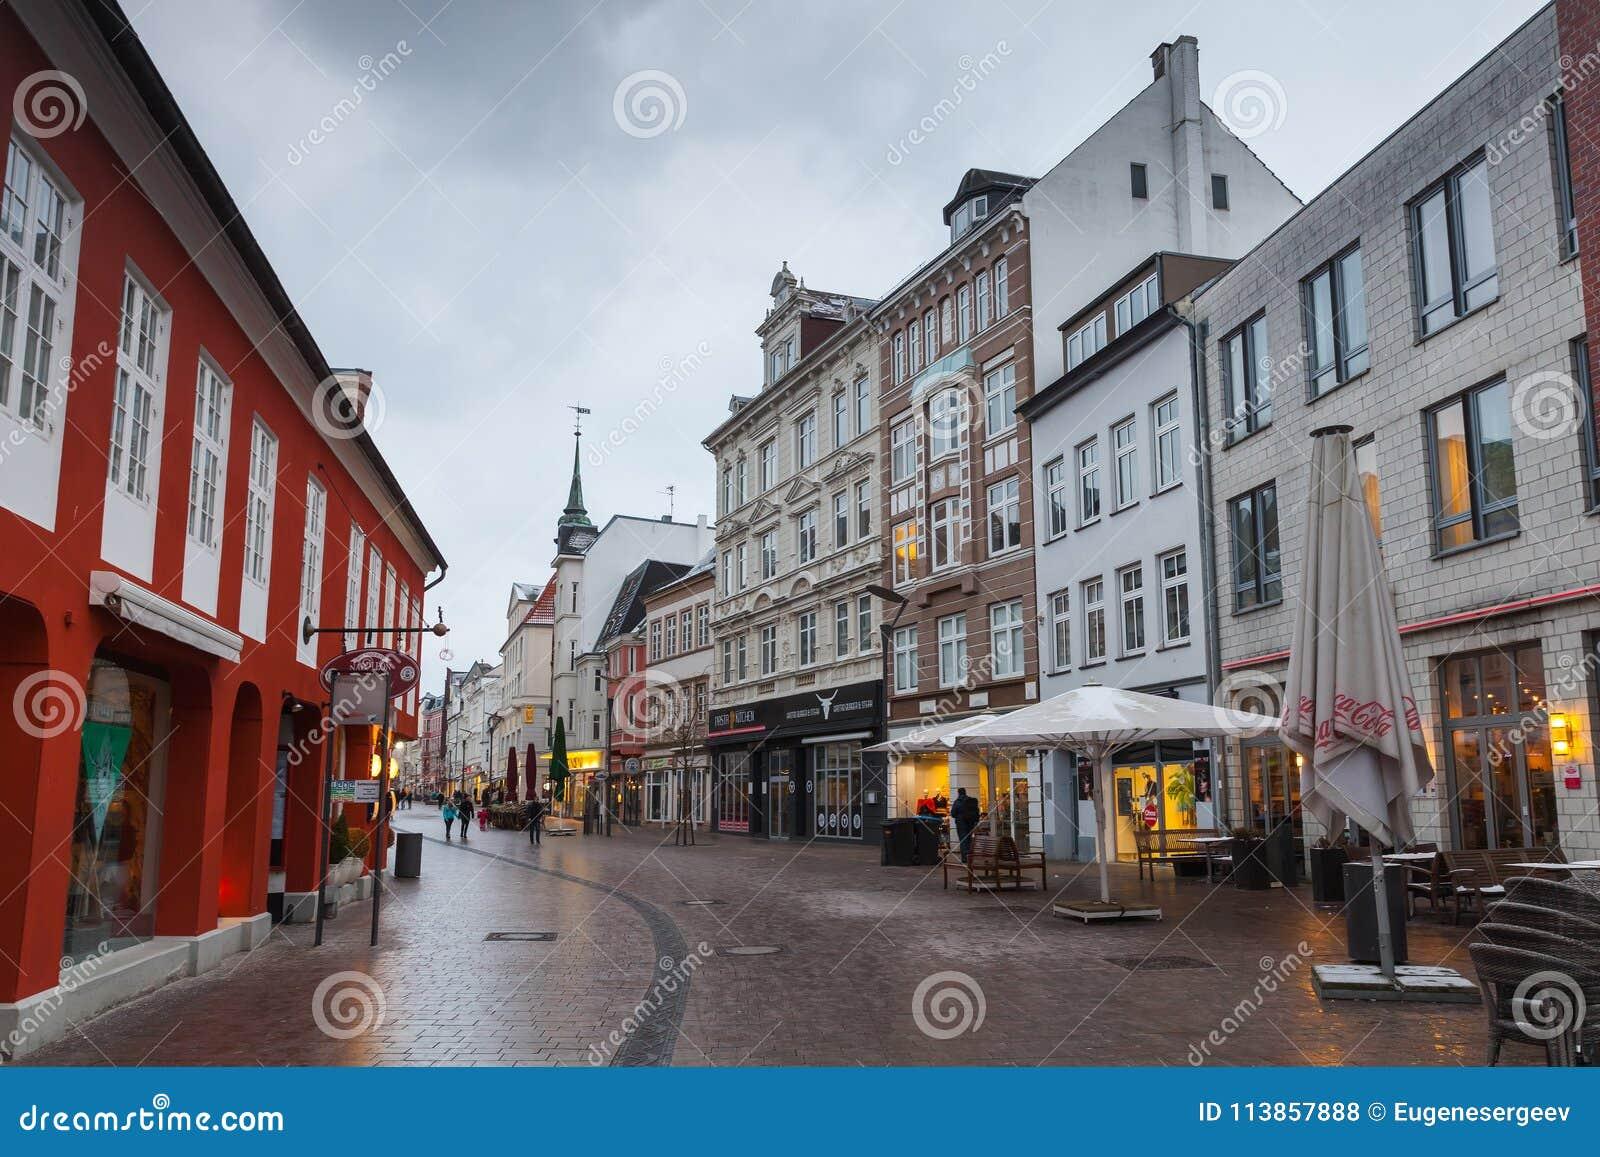 Flensburg Shopping